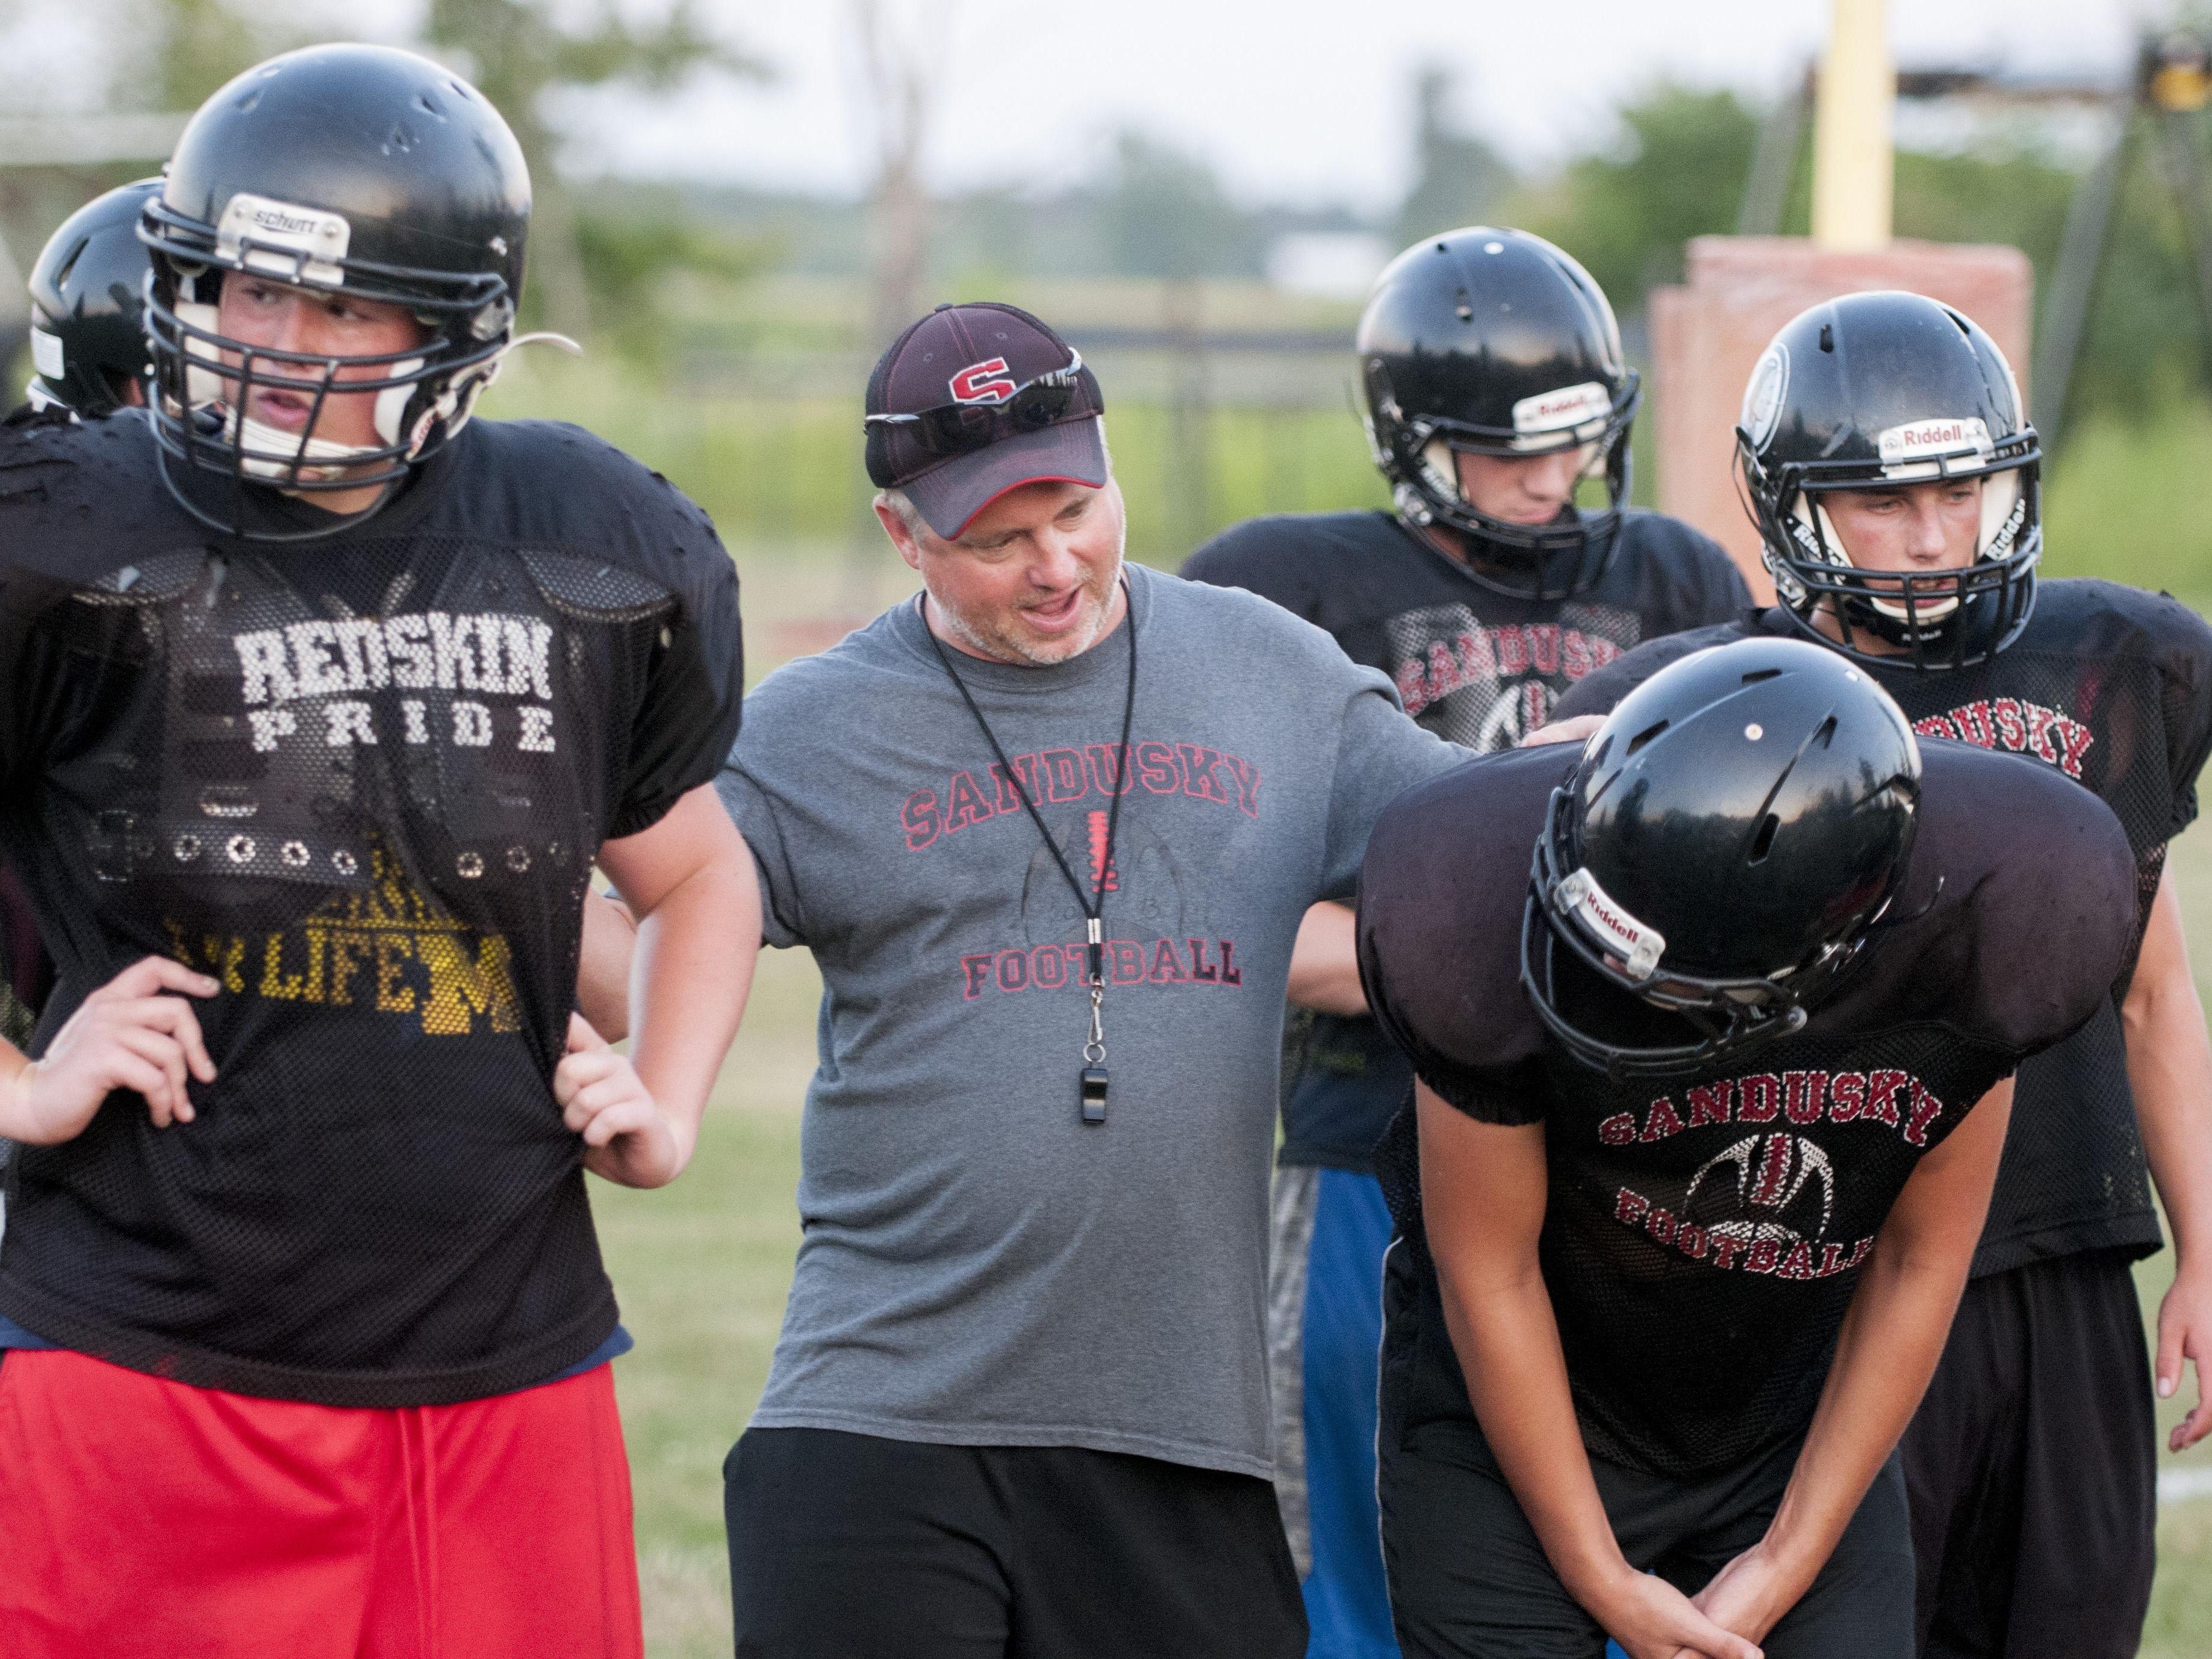 Sandusky Coach Craig Jacobson talks to his players during their practice Wednesday, Aug. 10 2016 at Sandusky High School.